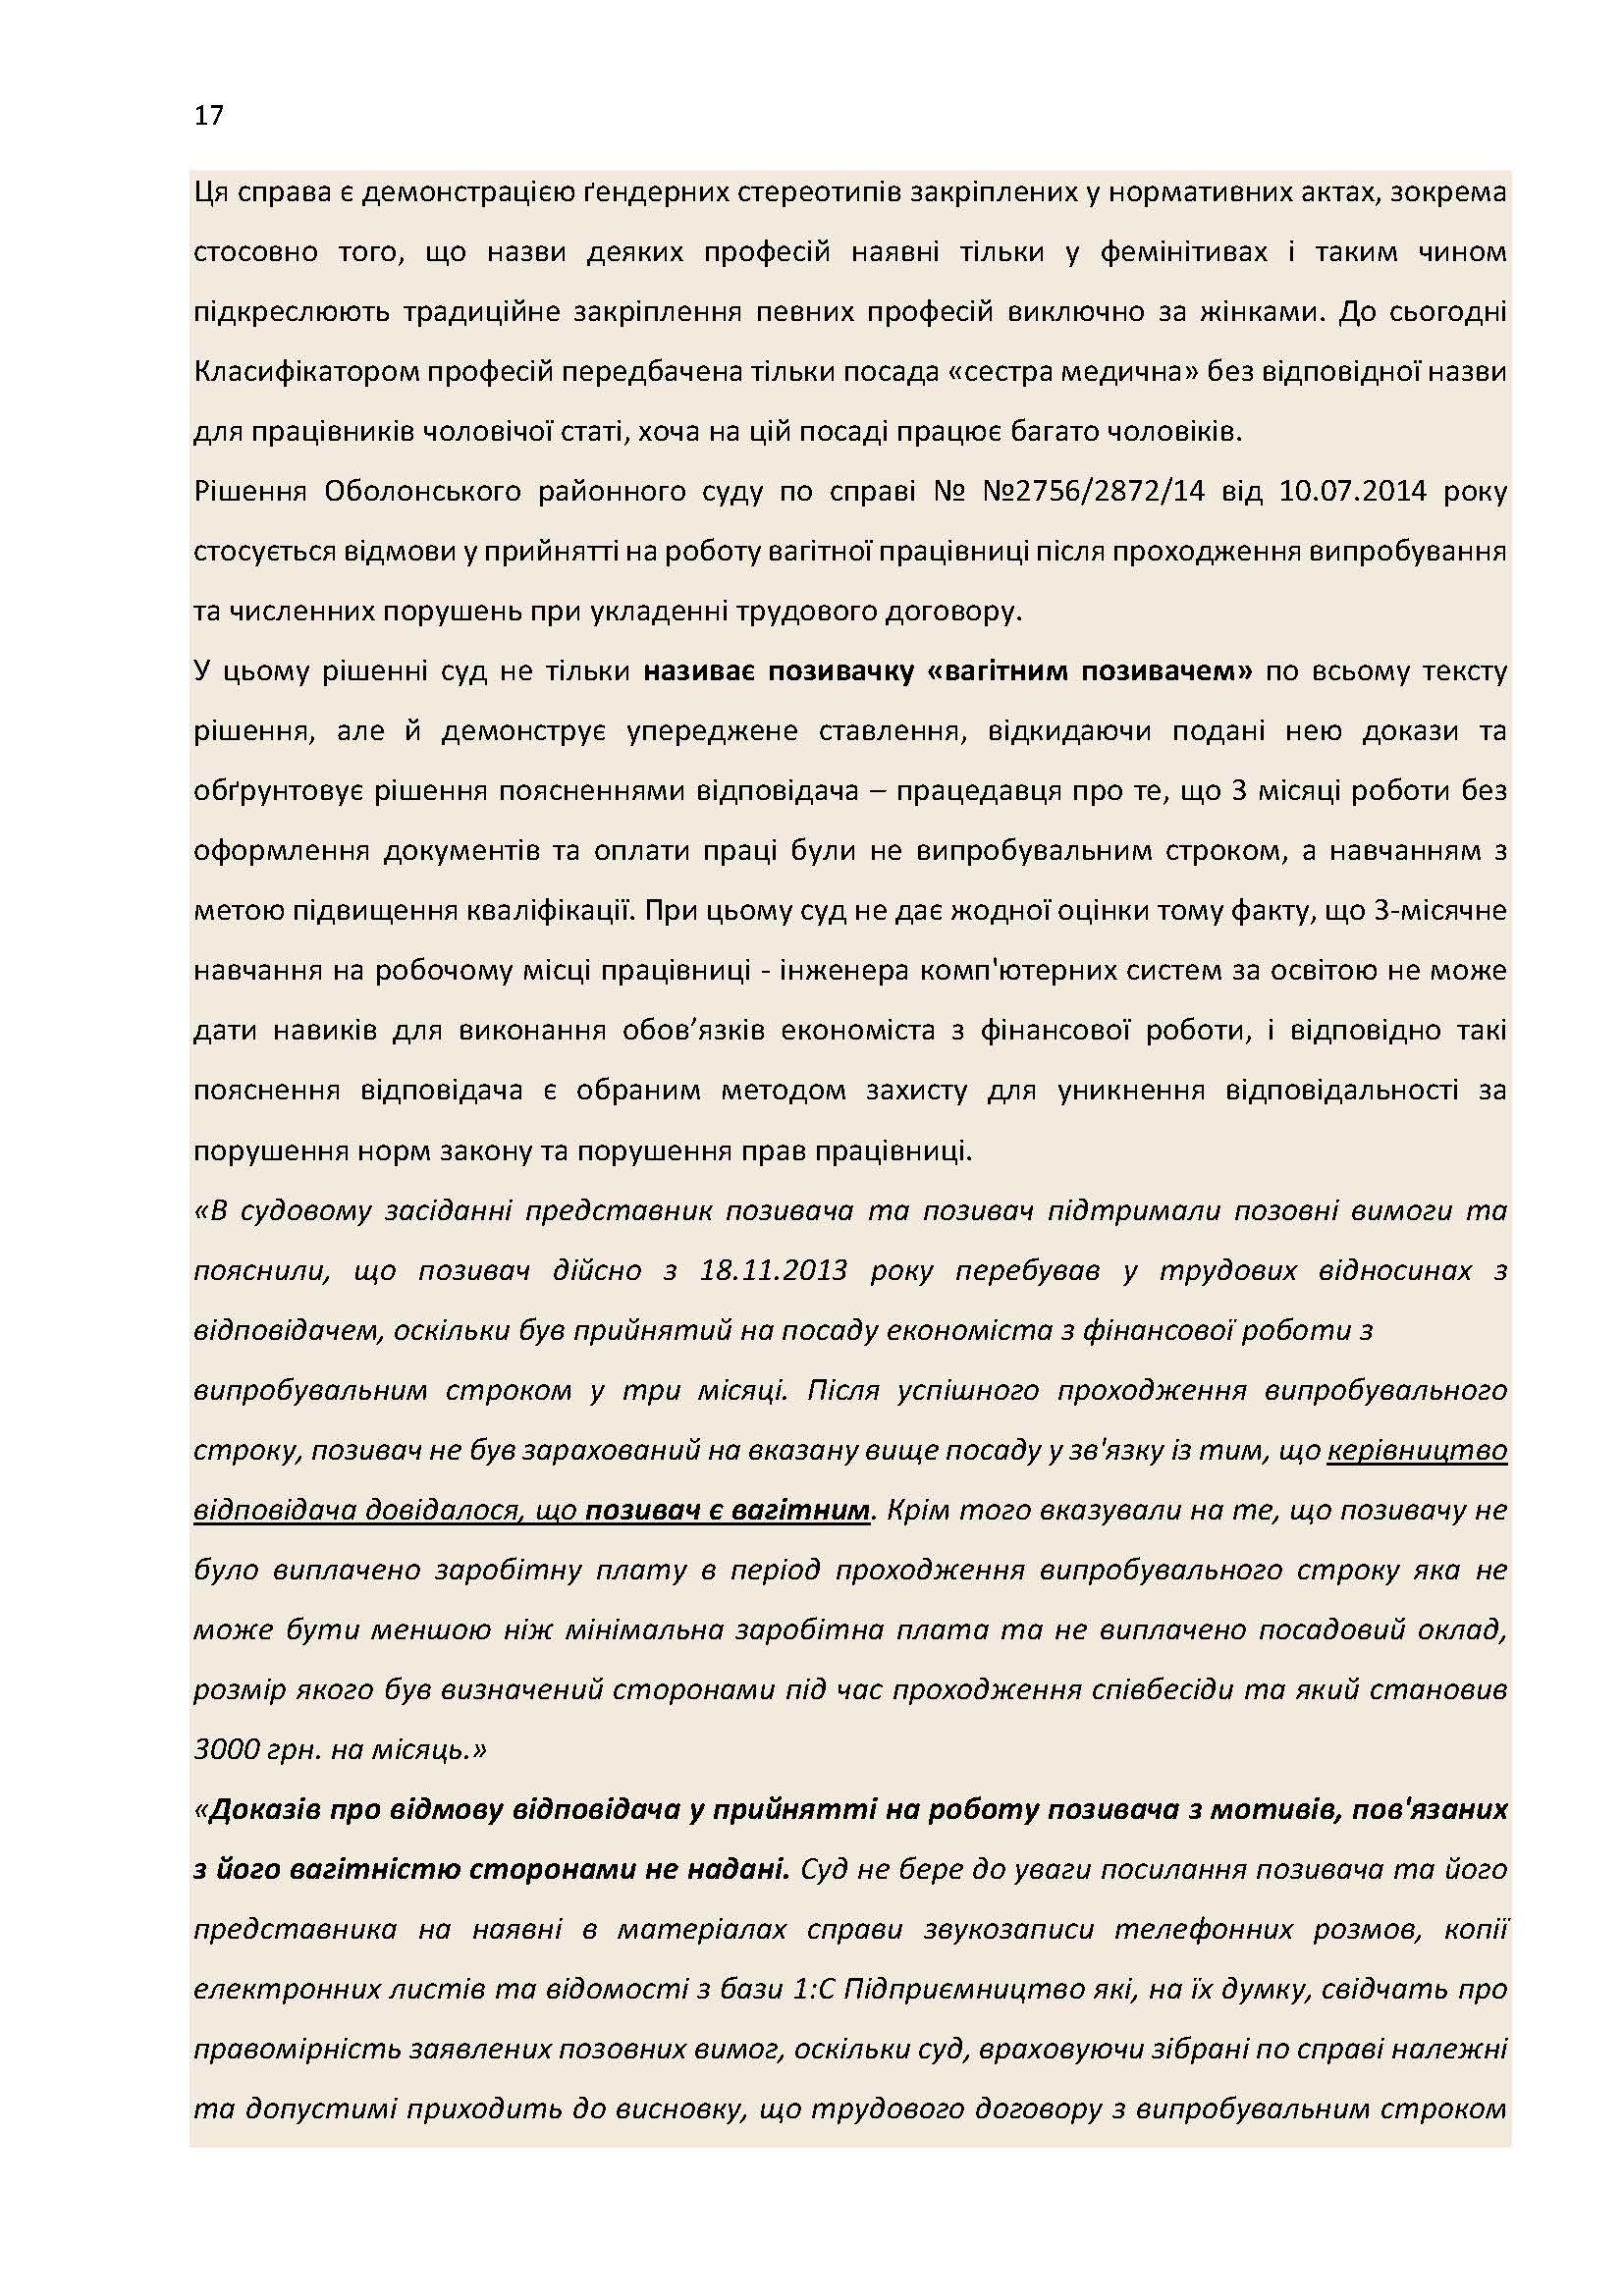 Draft Report monitoring print USAID_Страница_17